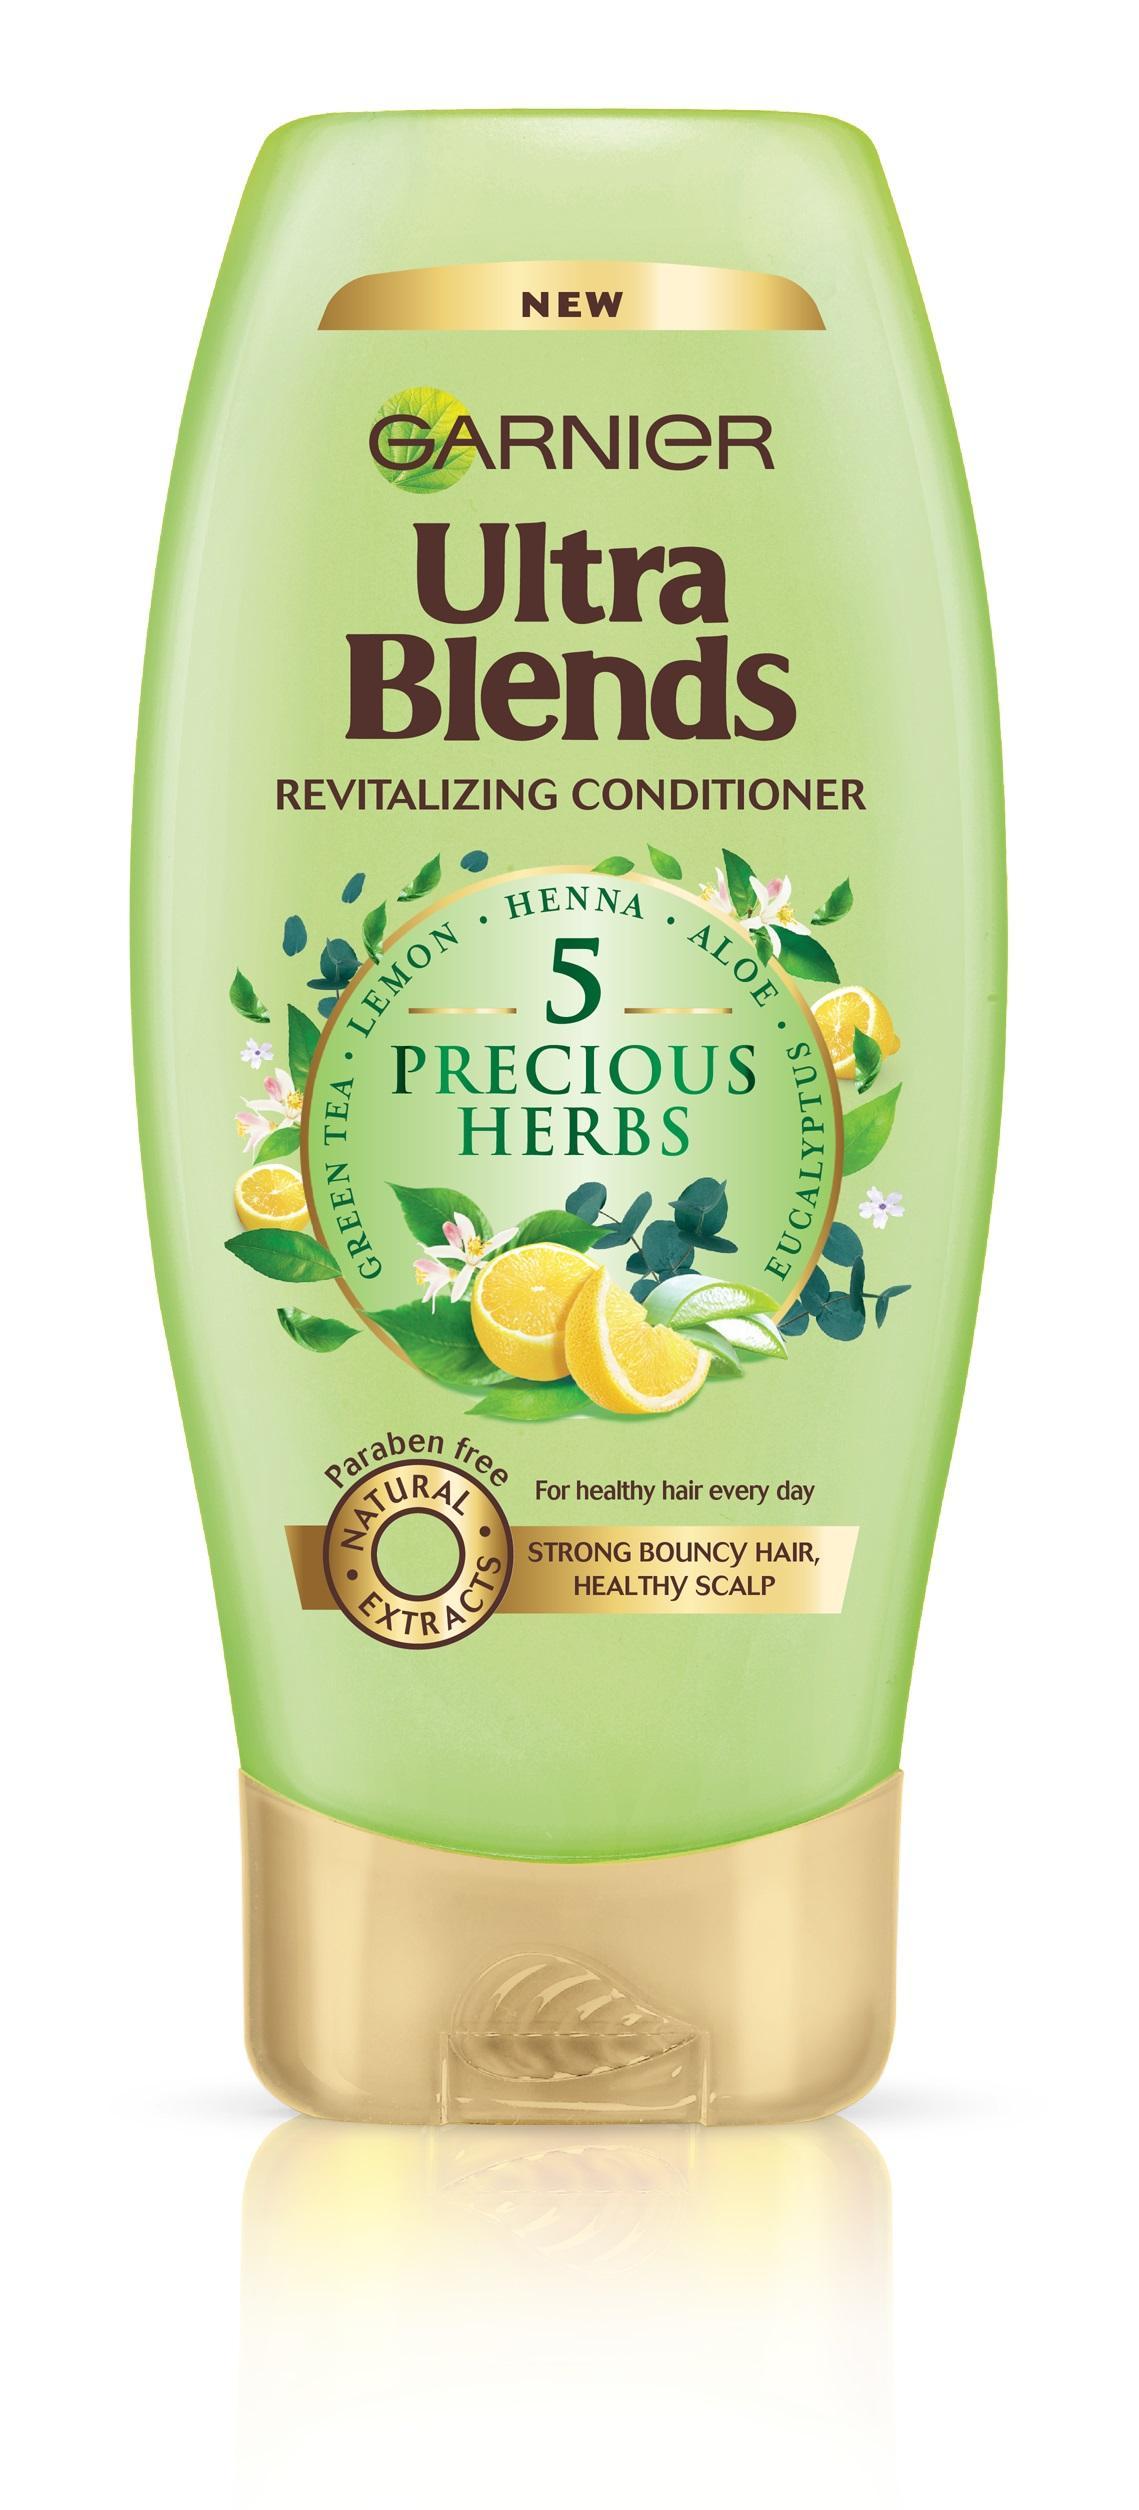 Garnier Ultra Blends 5 Precious Herbs, Conditioner 175ml